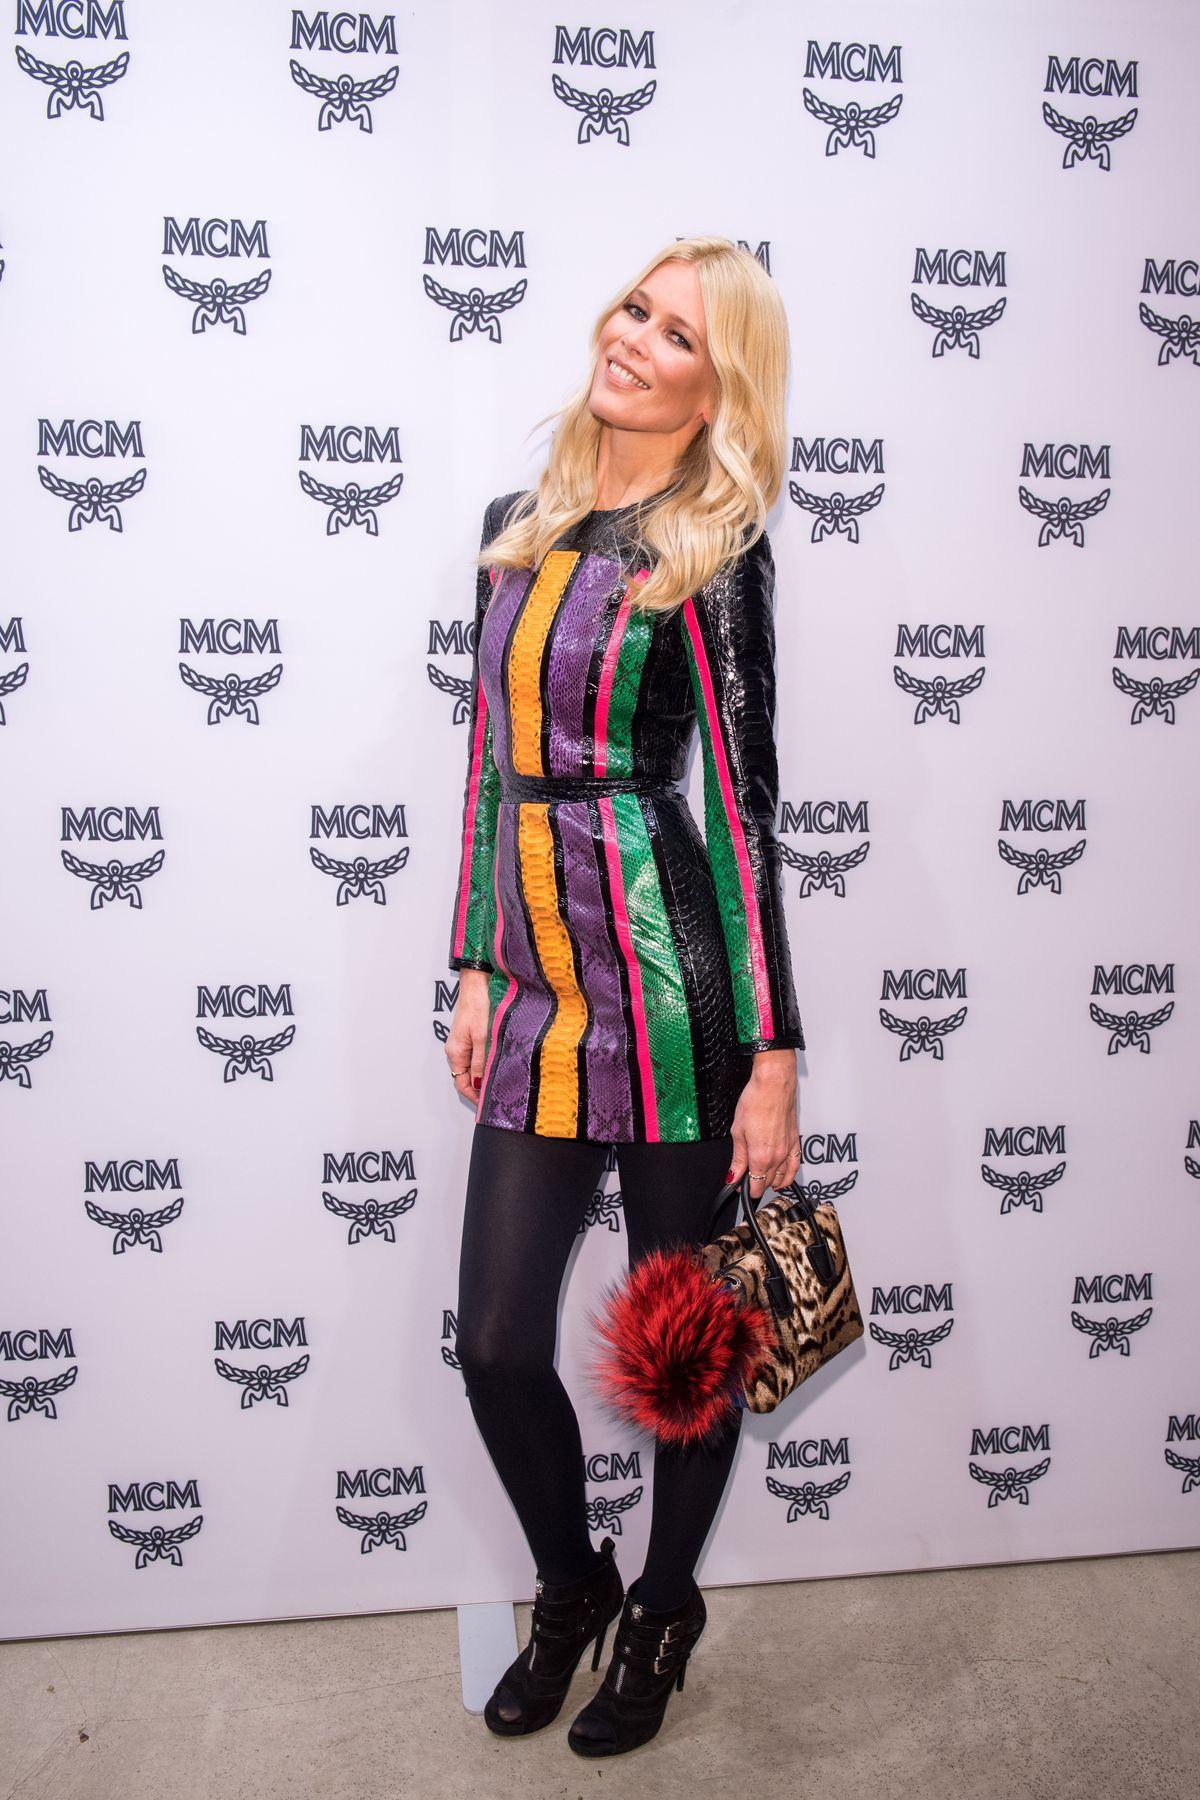 CLAUDIA SCHIFFER at MCM Luxury Birthday Party in Munich 11/17/2016